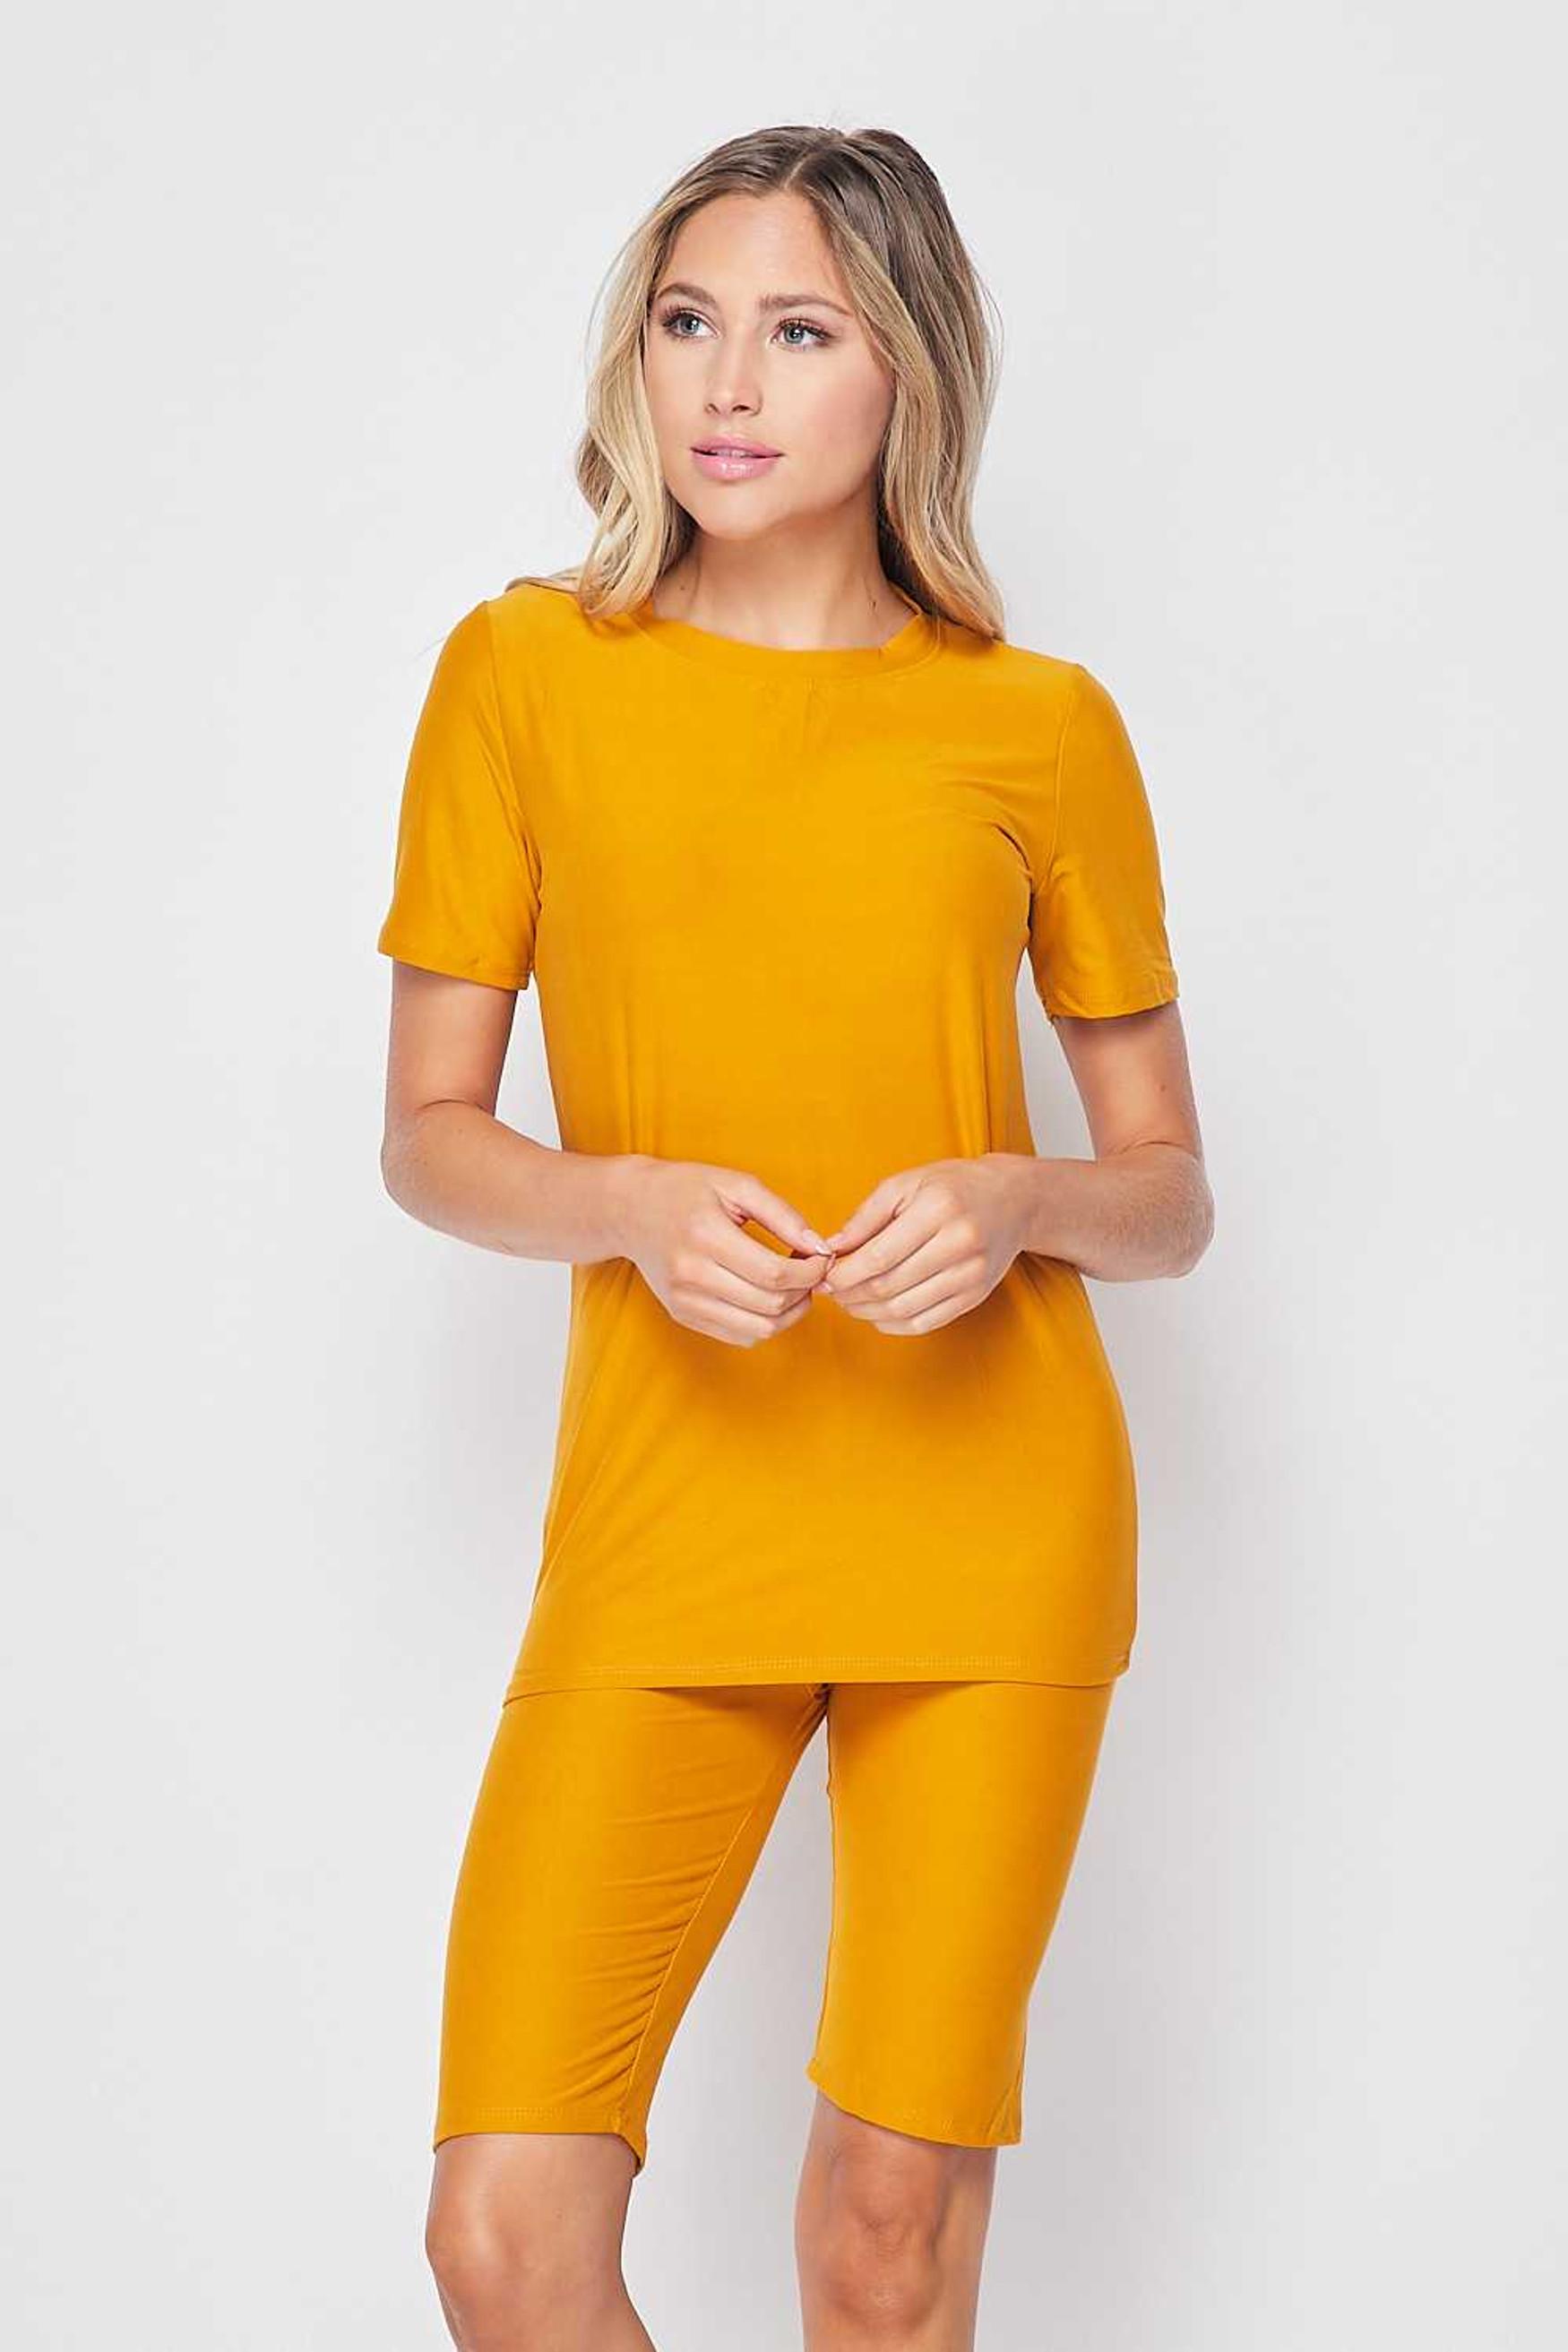 Mustard Buttery Soft Basic Solid Biker Shorts and T-Shirt Set